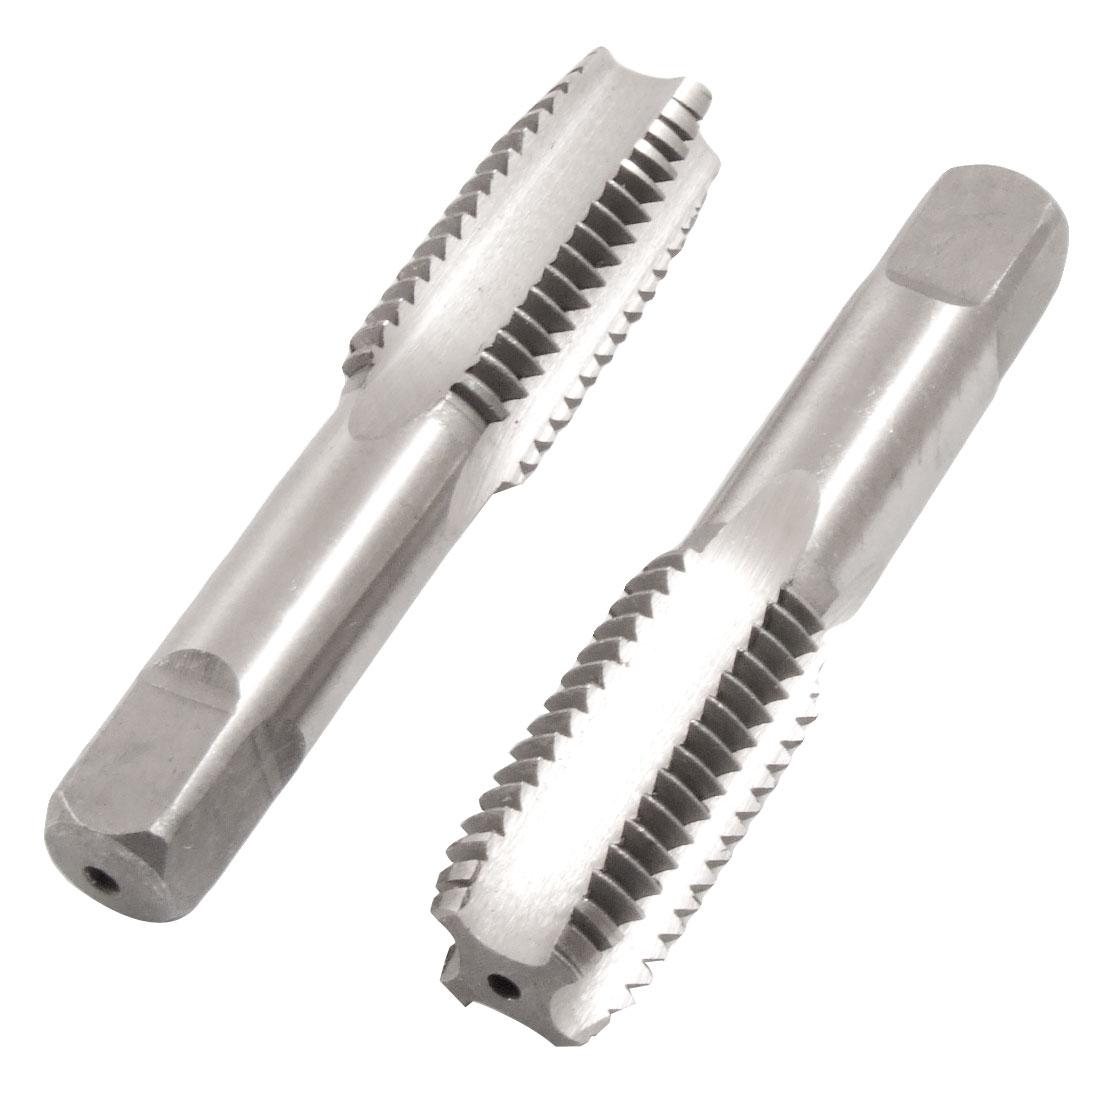 2 x M18 18mm High Speed Steel HSS Hand Screw Thread Metric Taps